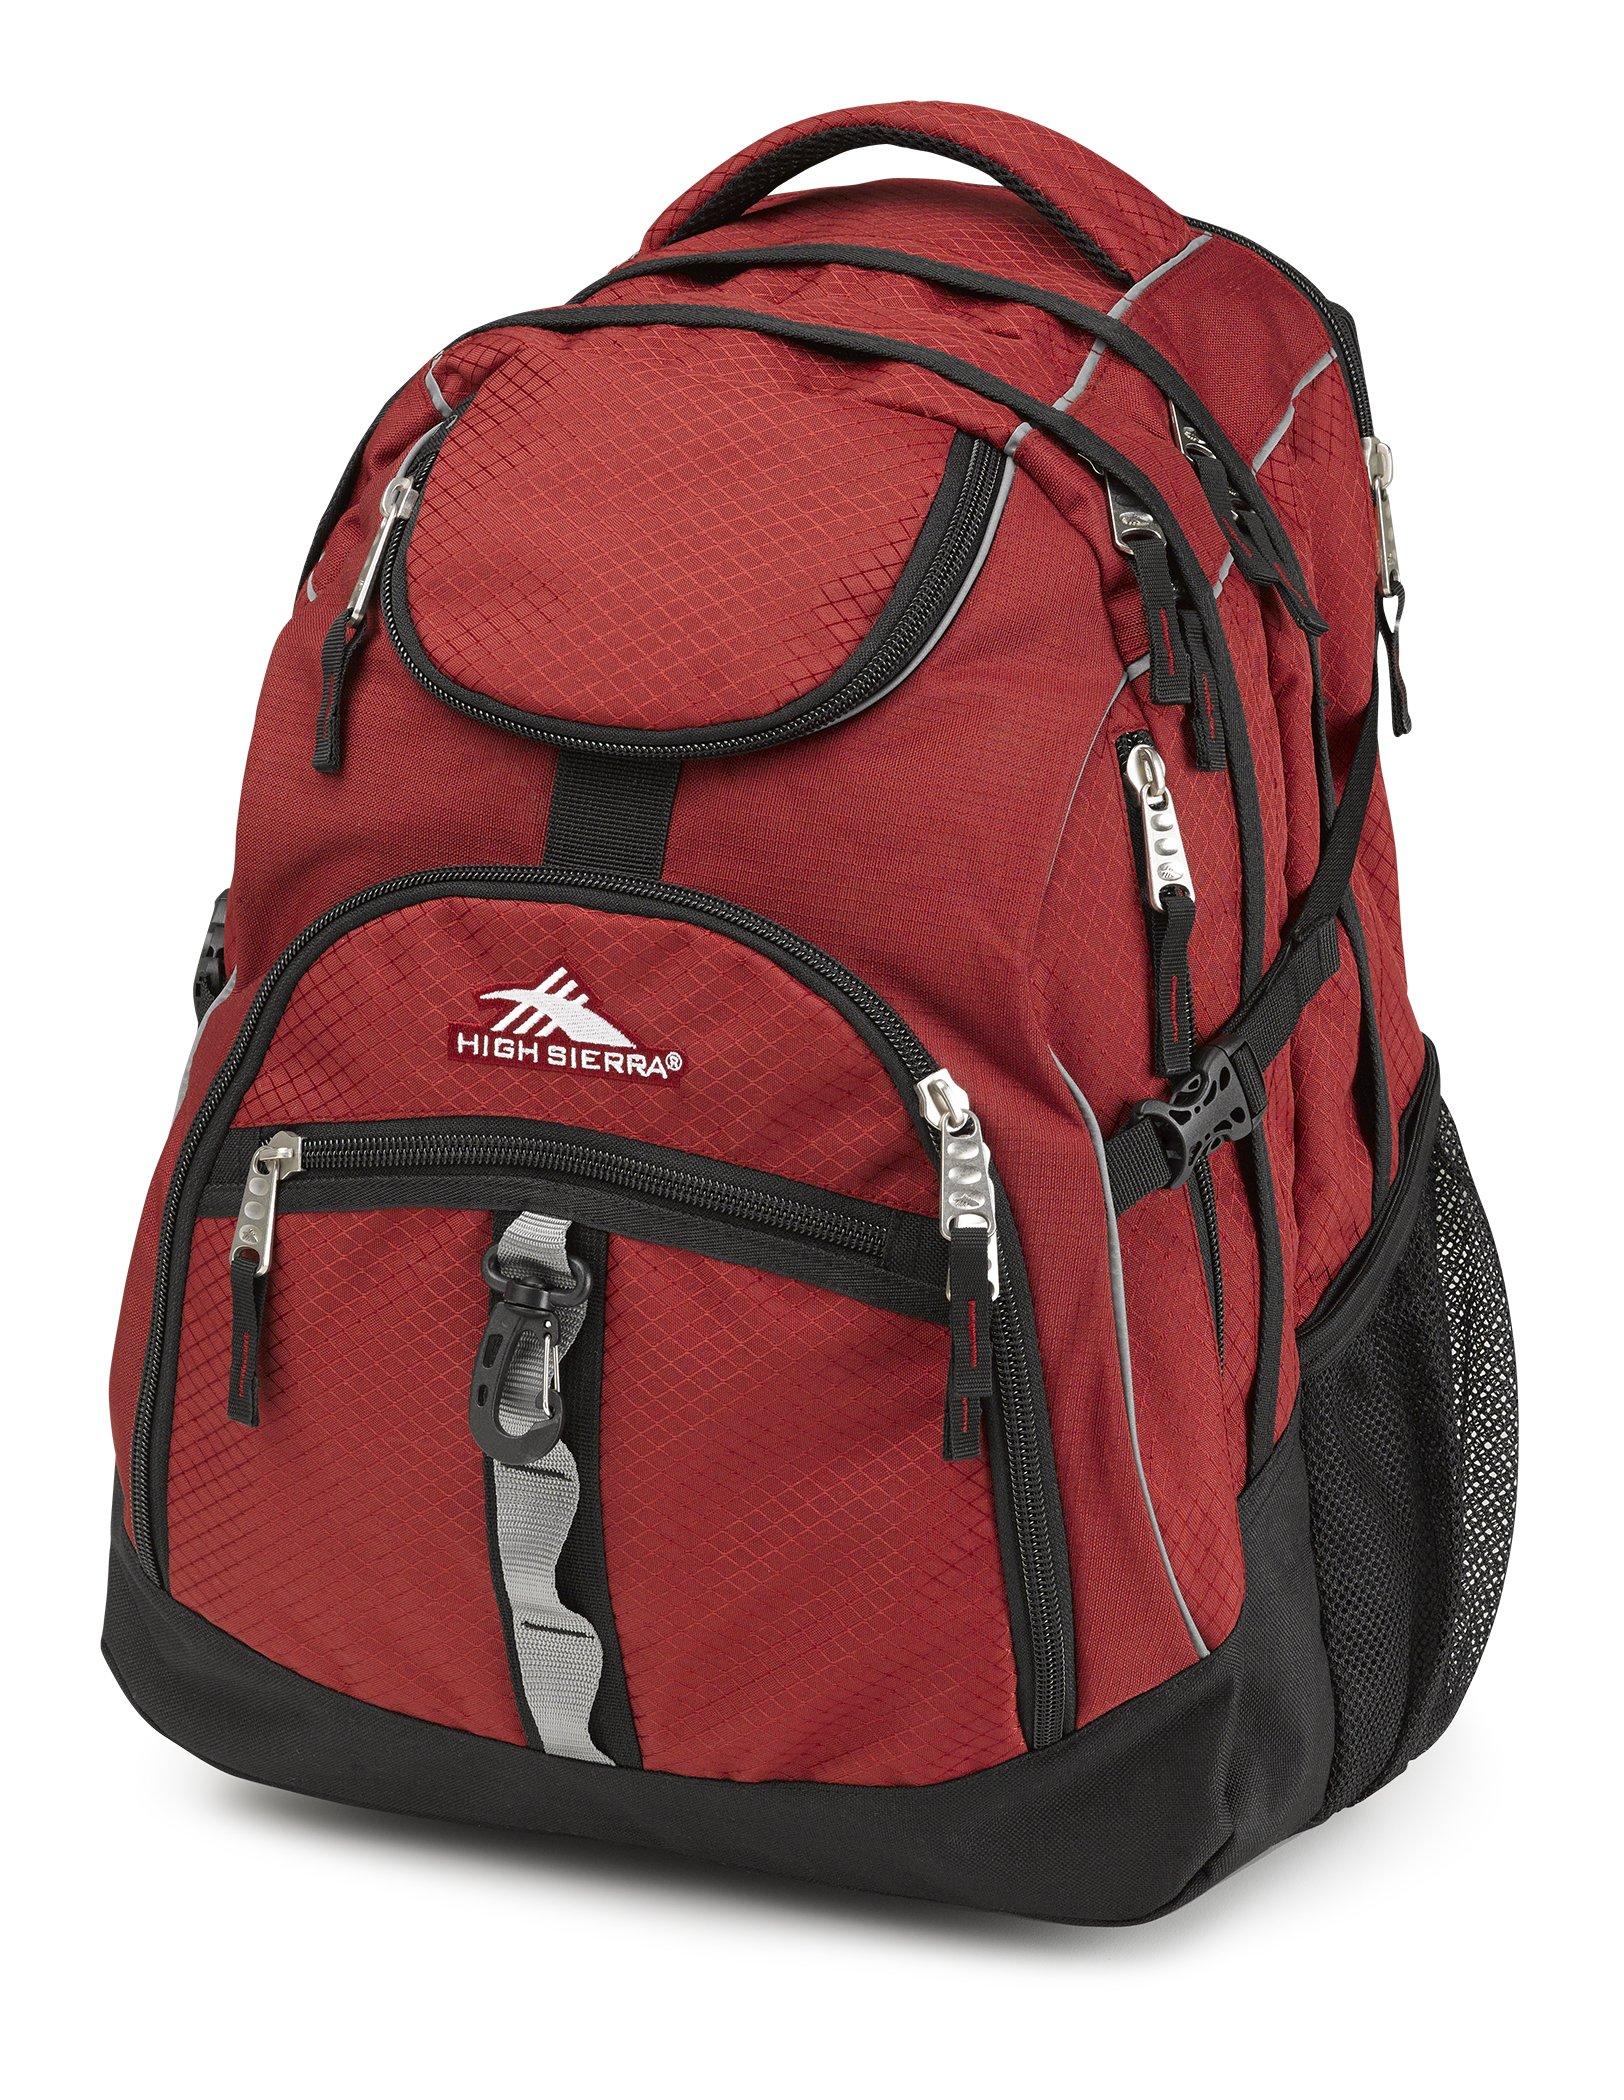 High Sierra Access Laptop Backpack, Brick/Black